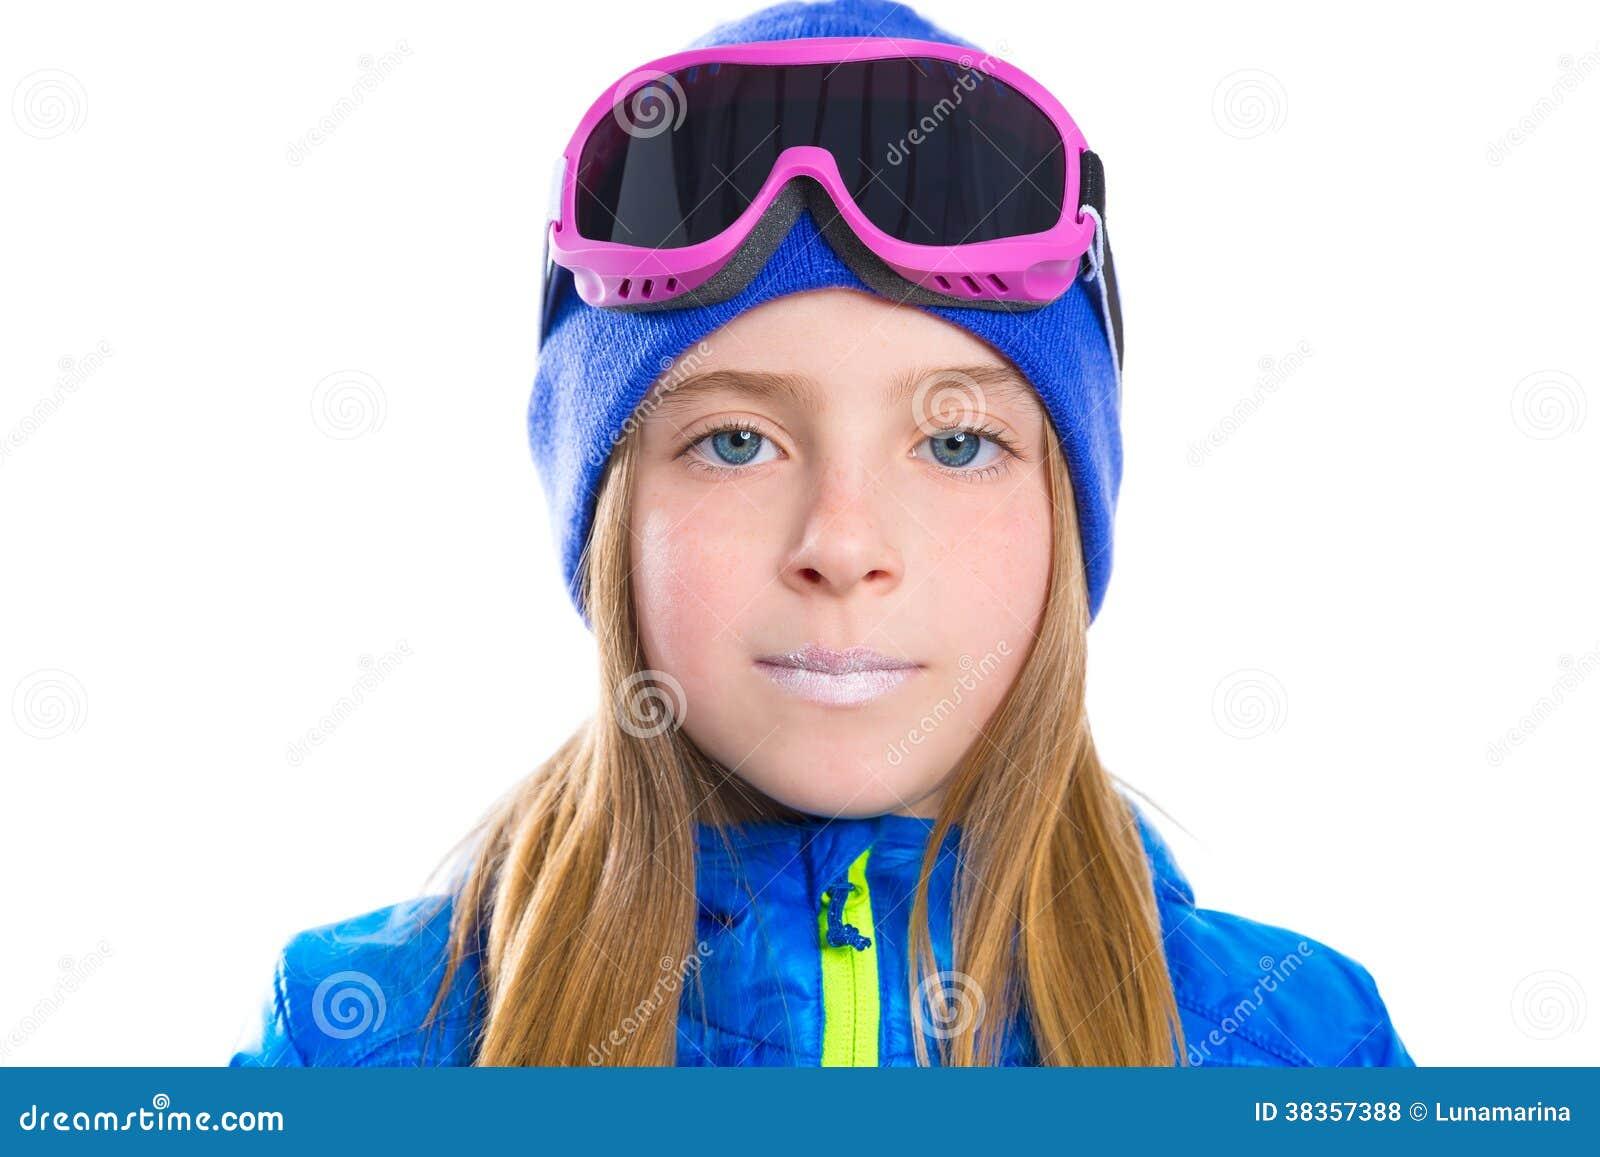 Blond Kid Girl Winter Portrait With Ski Snow Goggles Stock Photo ... 0b37d4343ba2